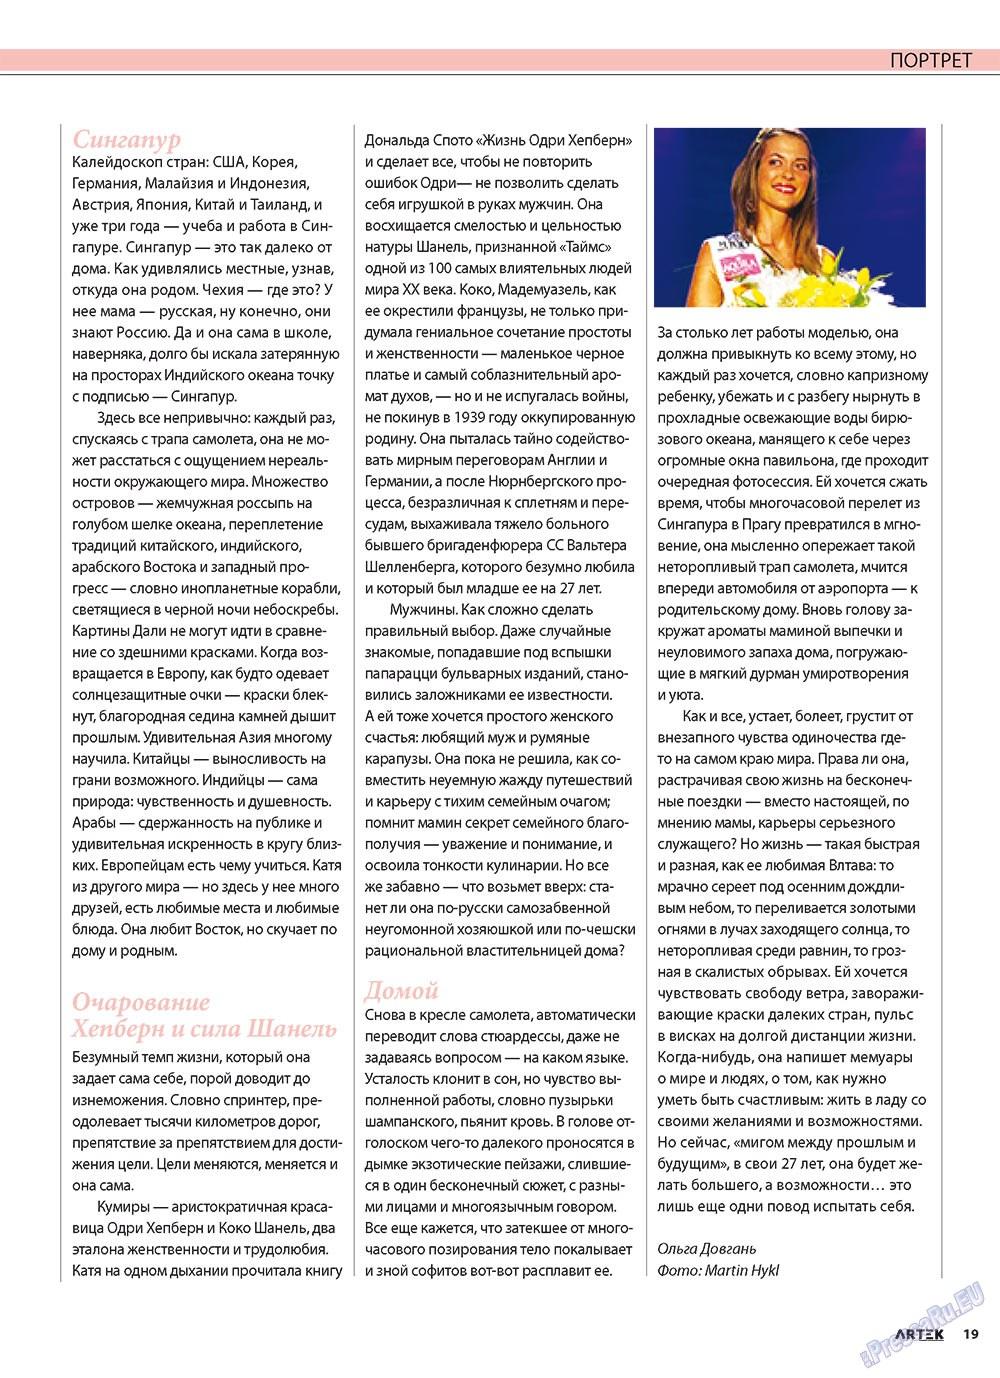 Артек (журнал). 2010 год, номер 5, стр. 21